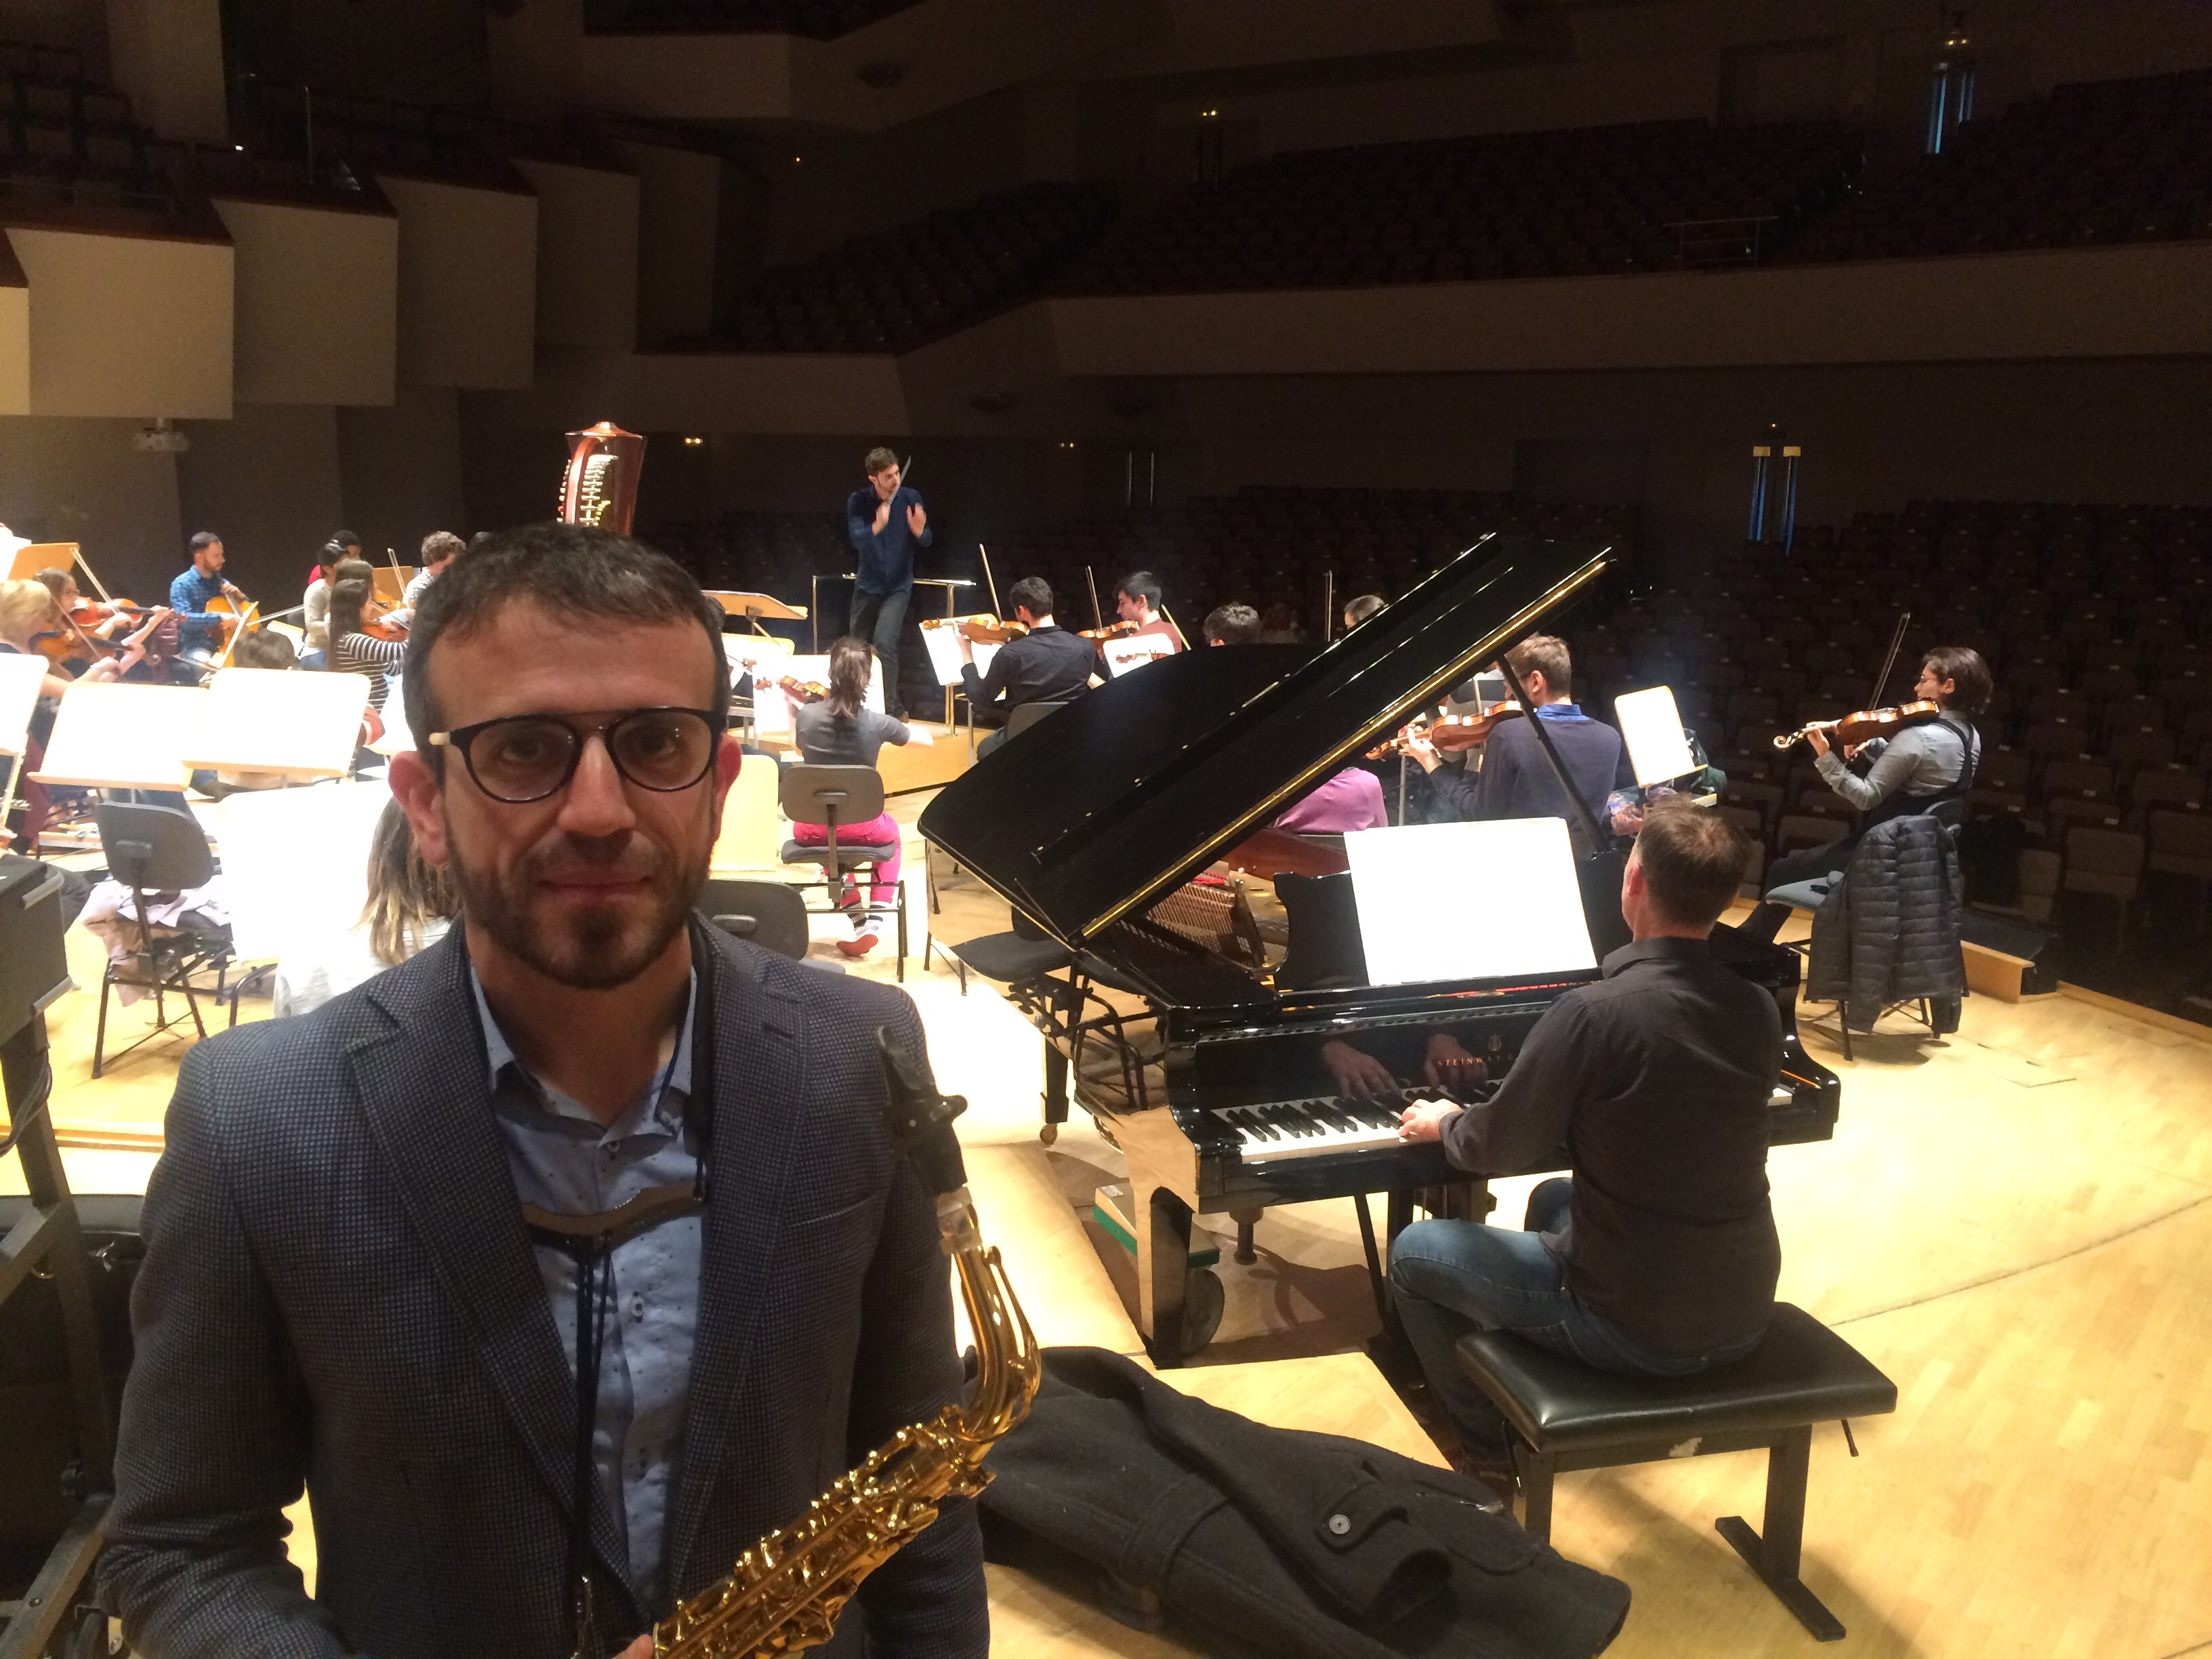 Royal Film Concert Orchestra. David